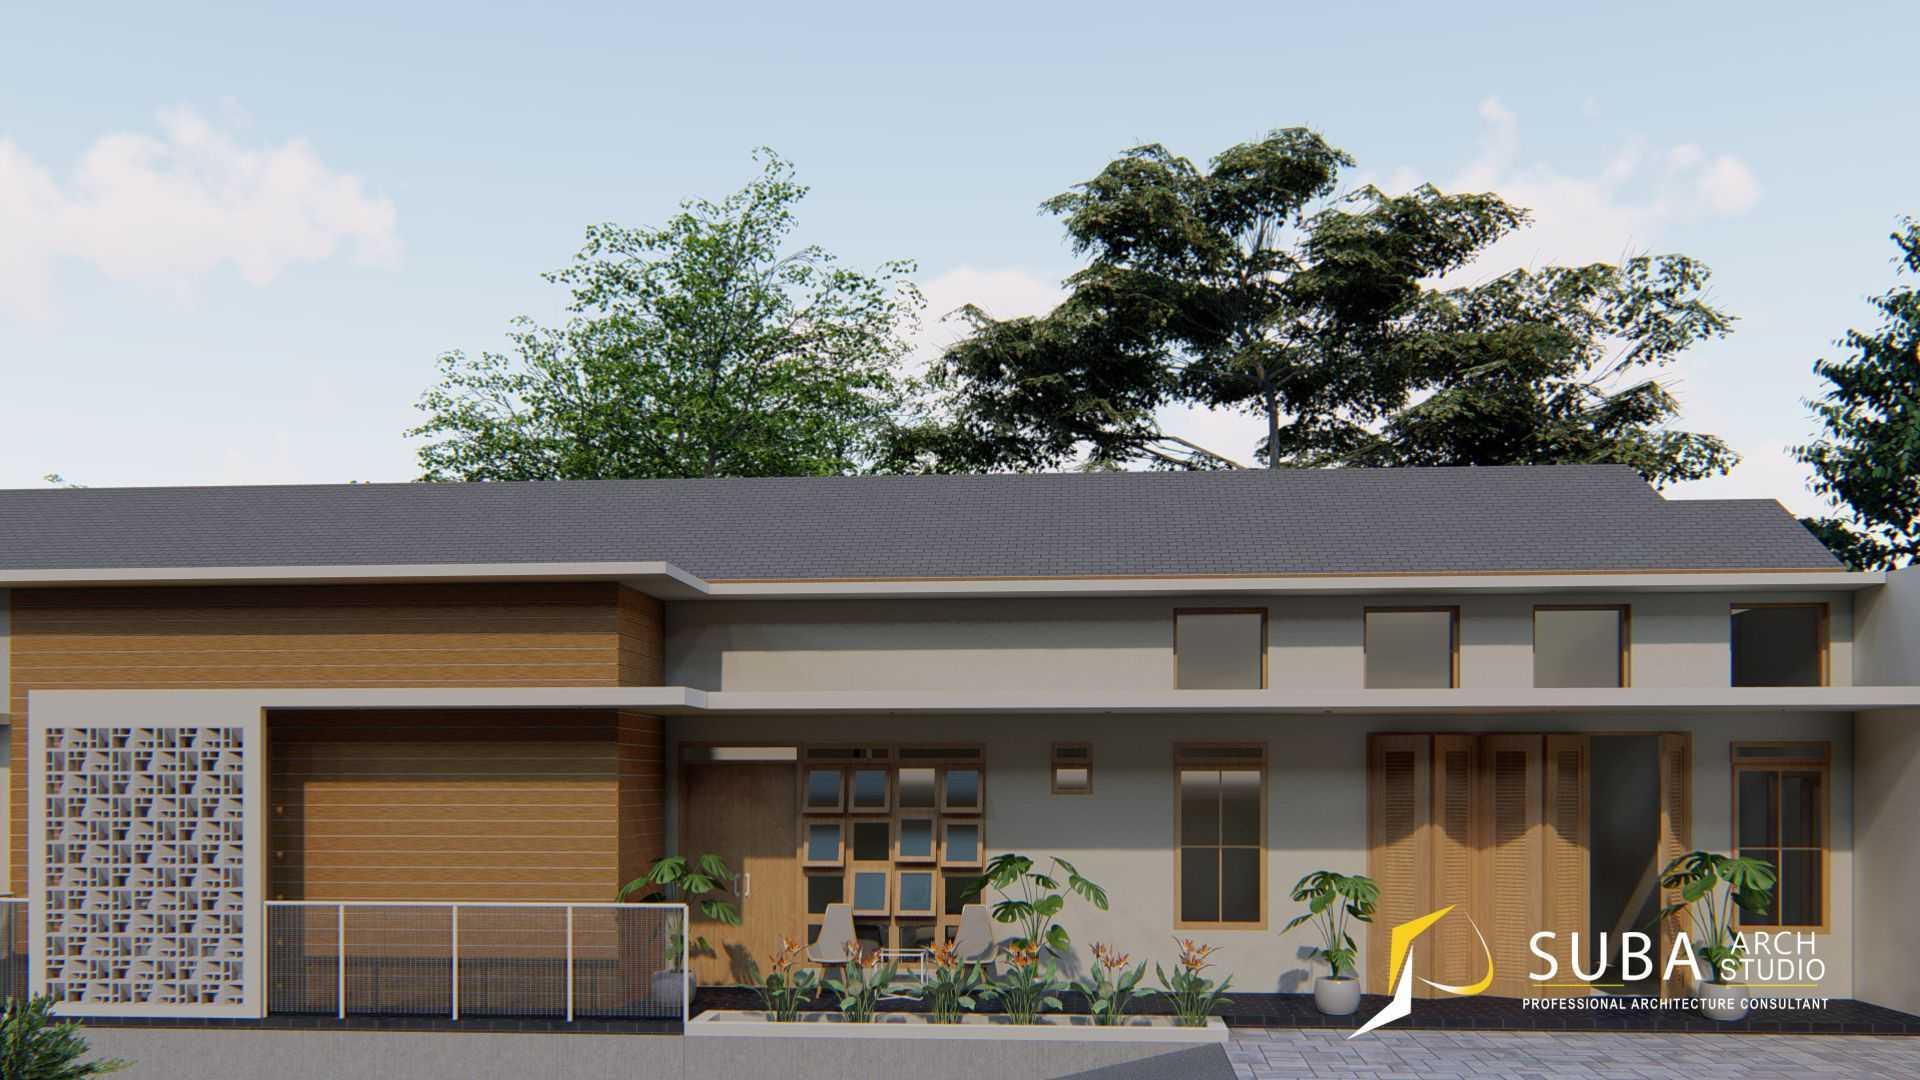 Suba-Arch Desain Rencana Rumah Tinggal Basement Dan Lt1 @pak Yadi Warnajati, Kec. Cibadak, Sukabumi Regency, Jawa Barat 43351, Indonesia Warnajati, Kec. Cibadak, Sukabumi Regency, Jawa Barat 43351, Indonesia Suba-Arch-Desain-Rencana-Rumah-Tinggal-Basement-Dan-Lt1-Pak-Yadi   86868